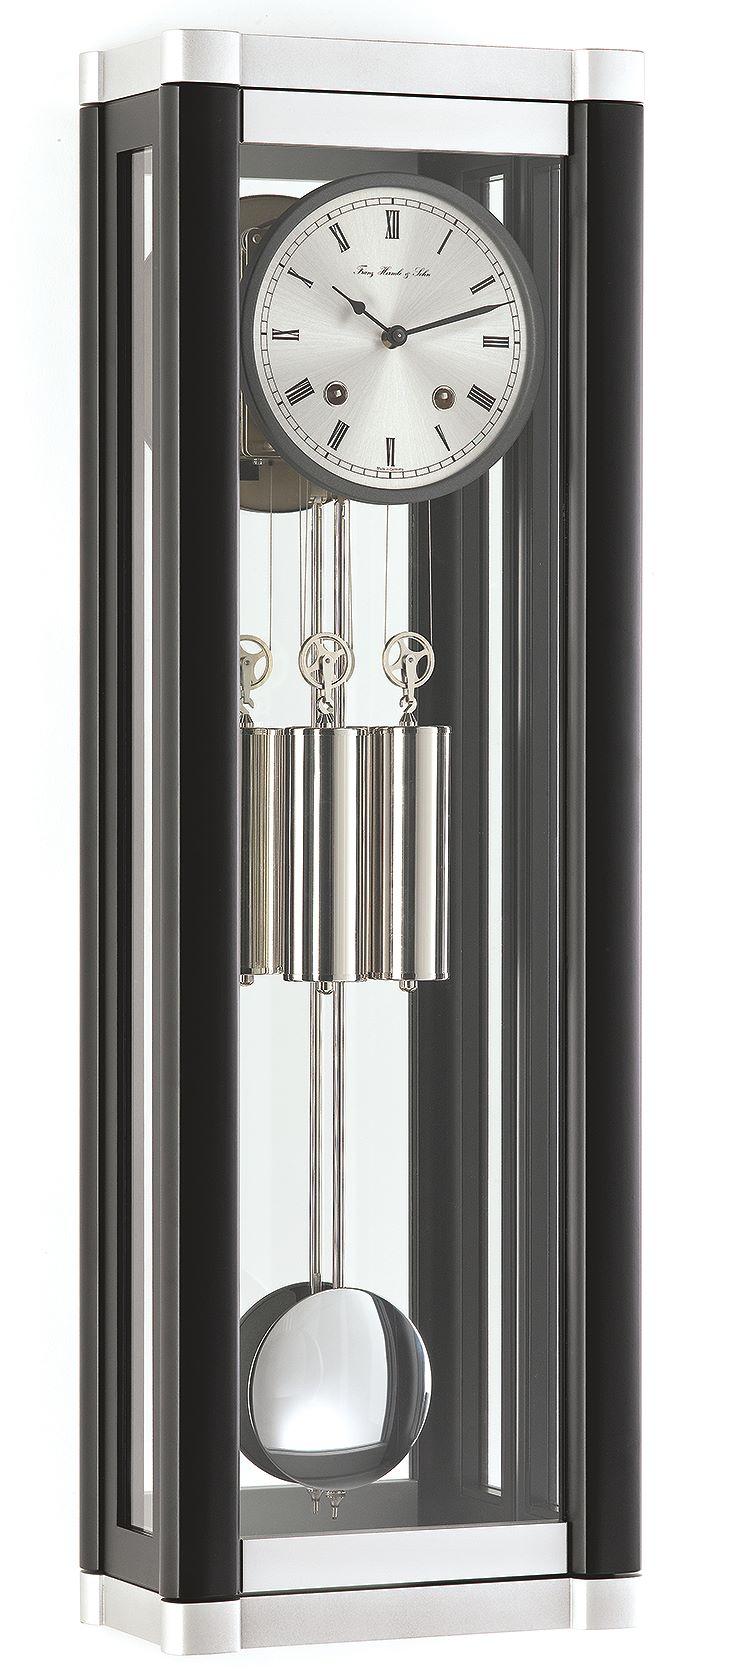 Moderne Pendeluhr von Hermle -Hermle -Cromwell - 70962-740058